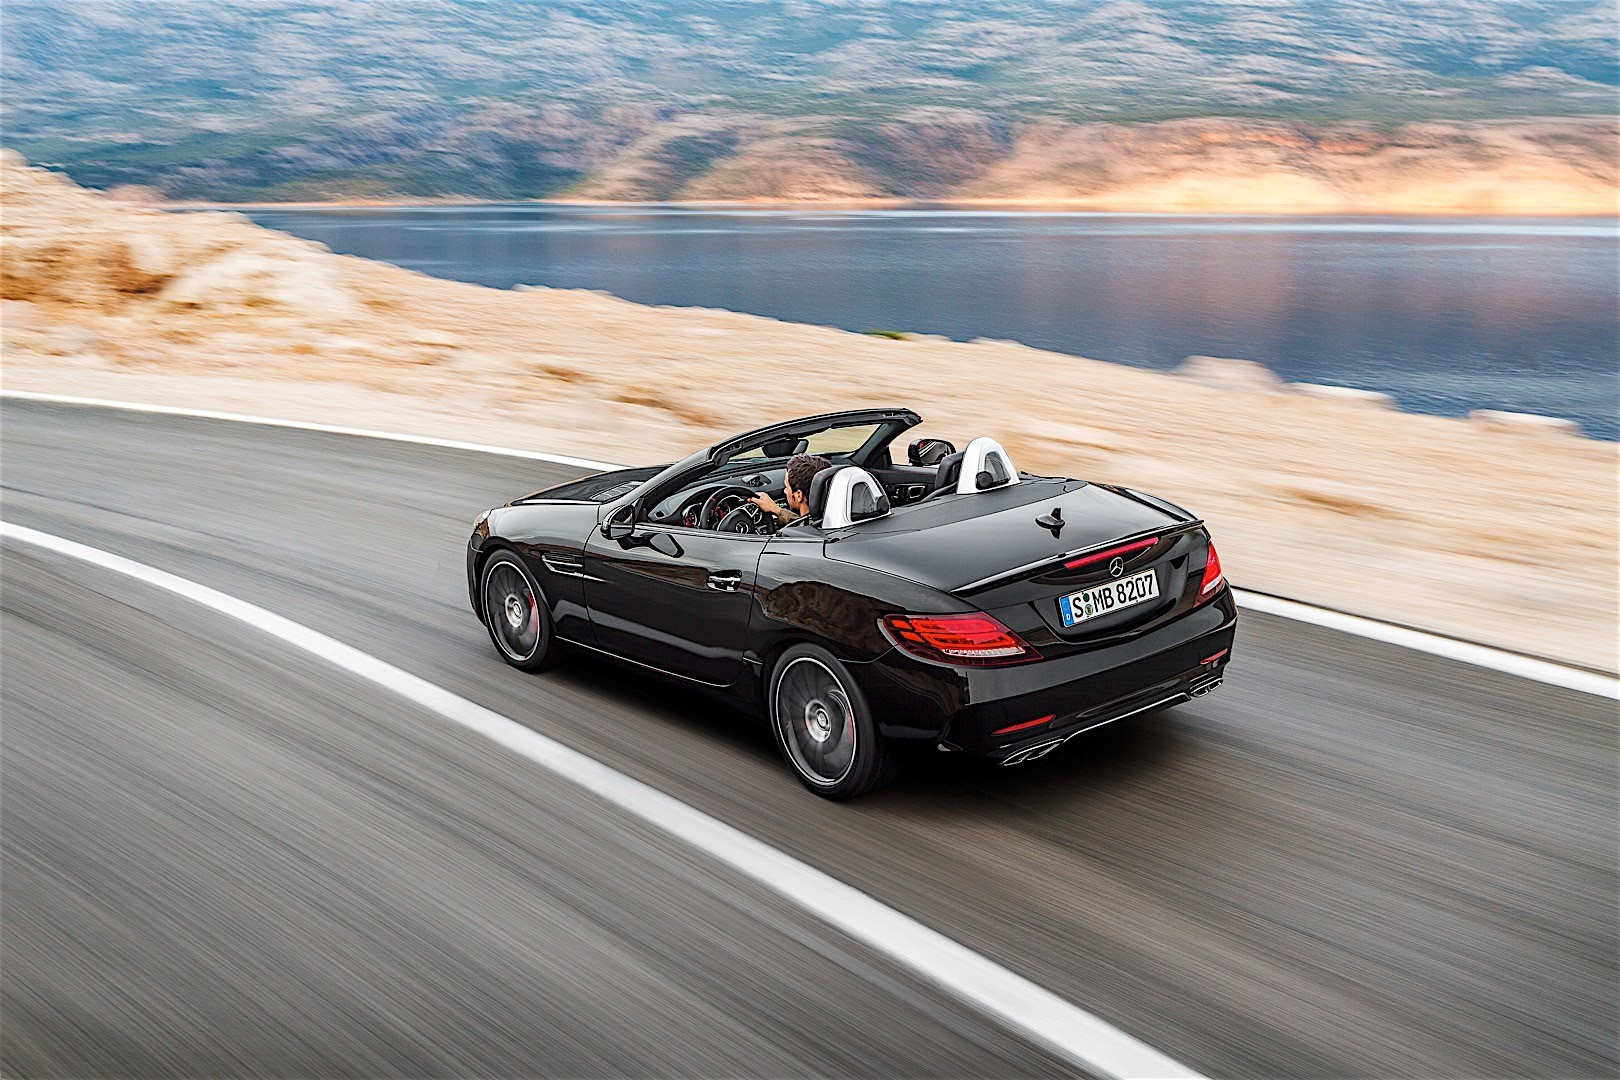 Mercedes amg slc 43 r172 specs 2016 2017 2018 for Mercedes benz amg slc 43